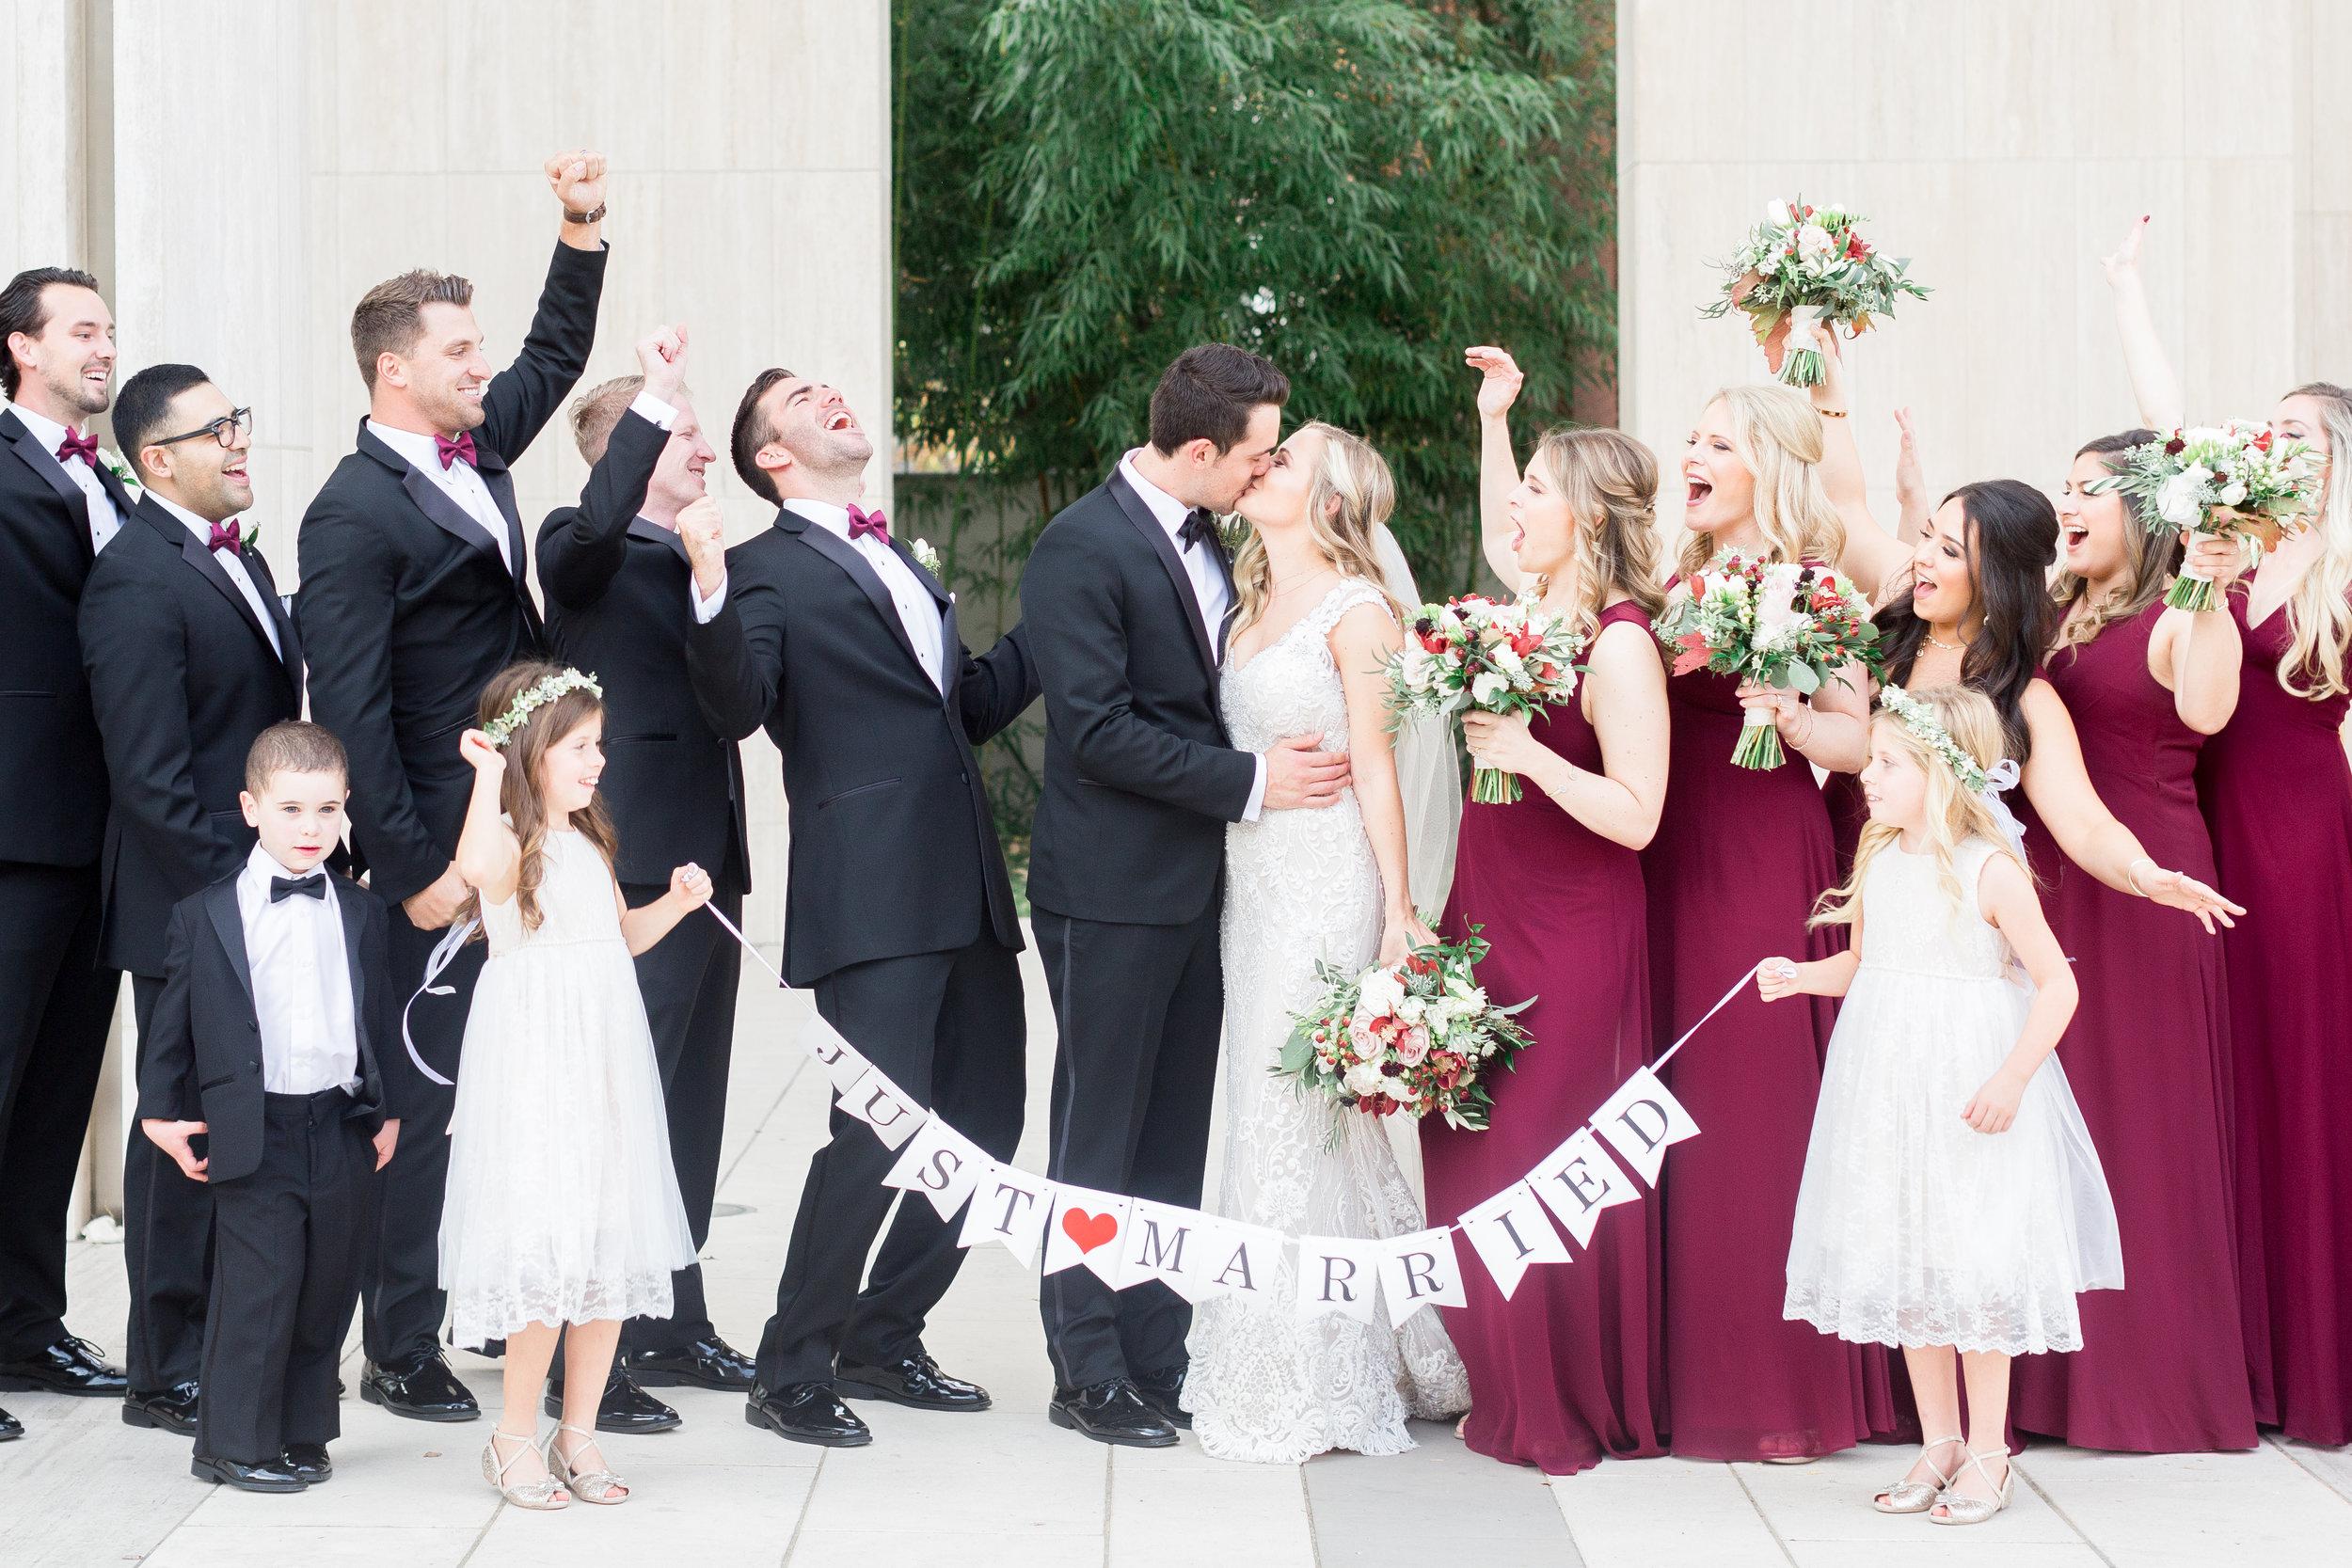 Downtown-San-Jose-wedding-photographer (108 of 335).jpg